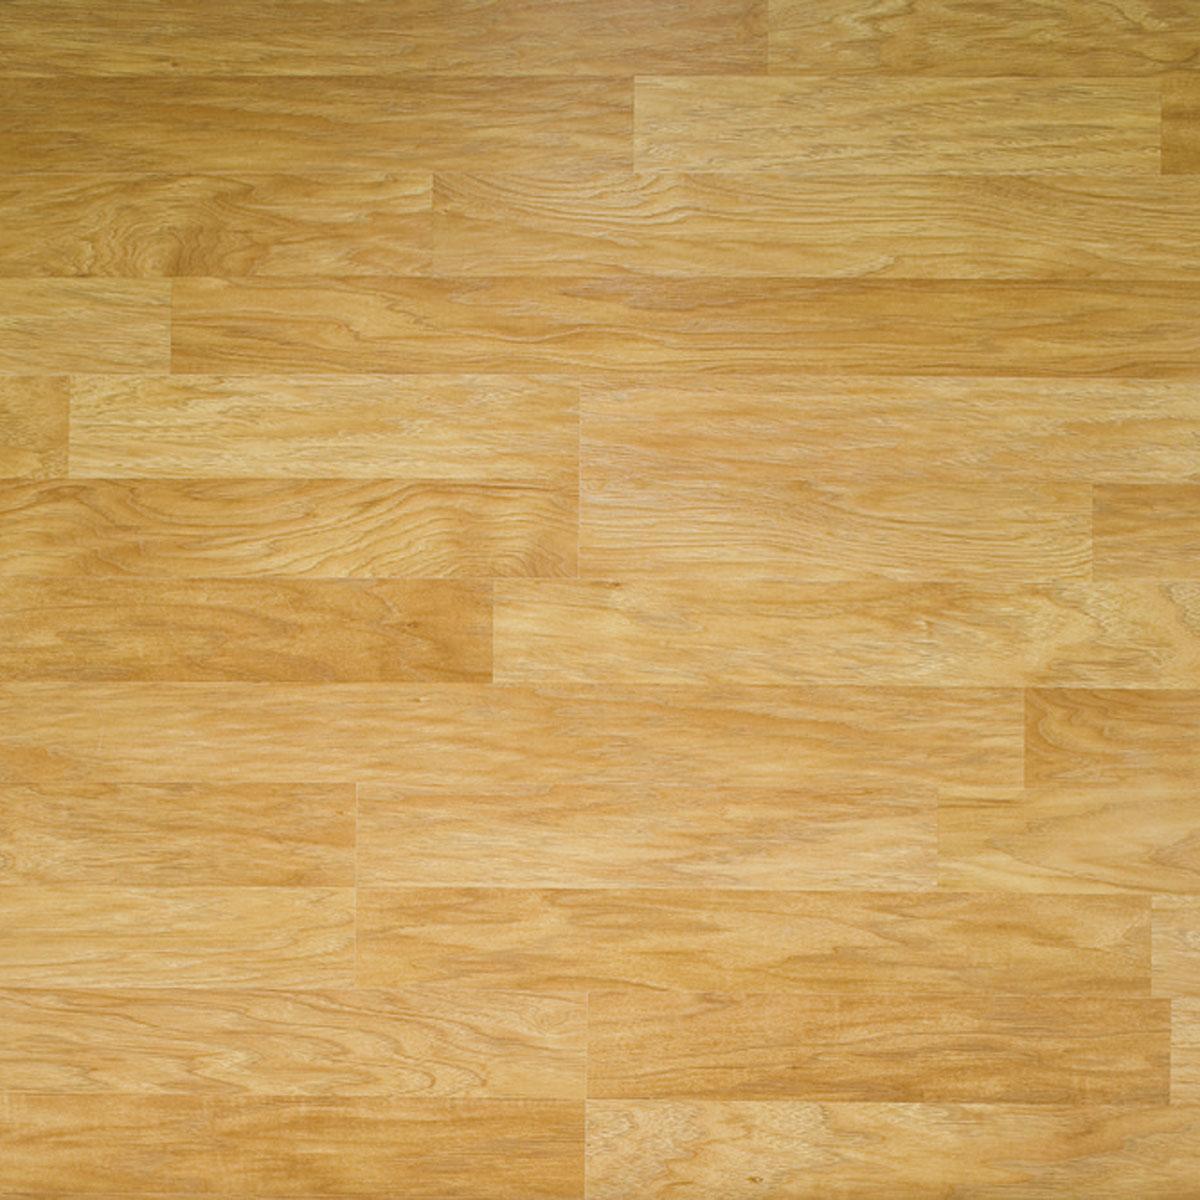 Laminate Flooring Texture Seamless LIFZCZH